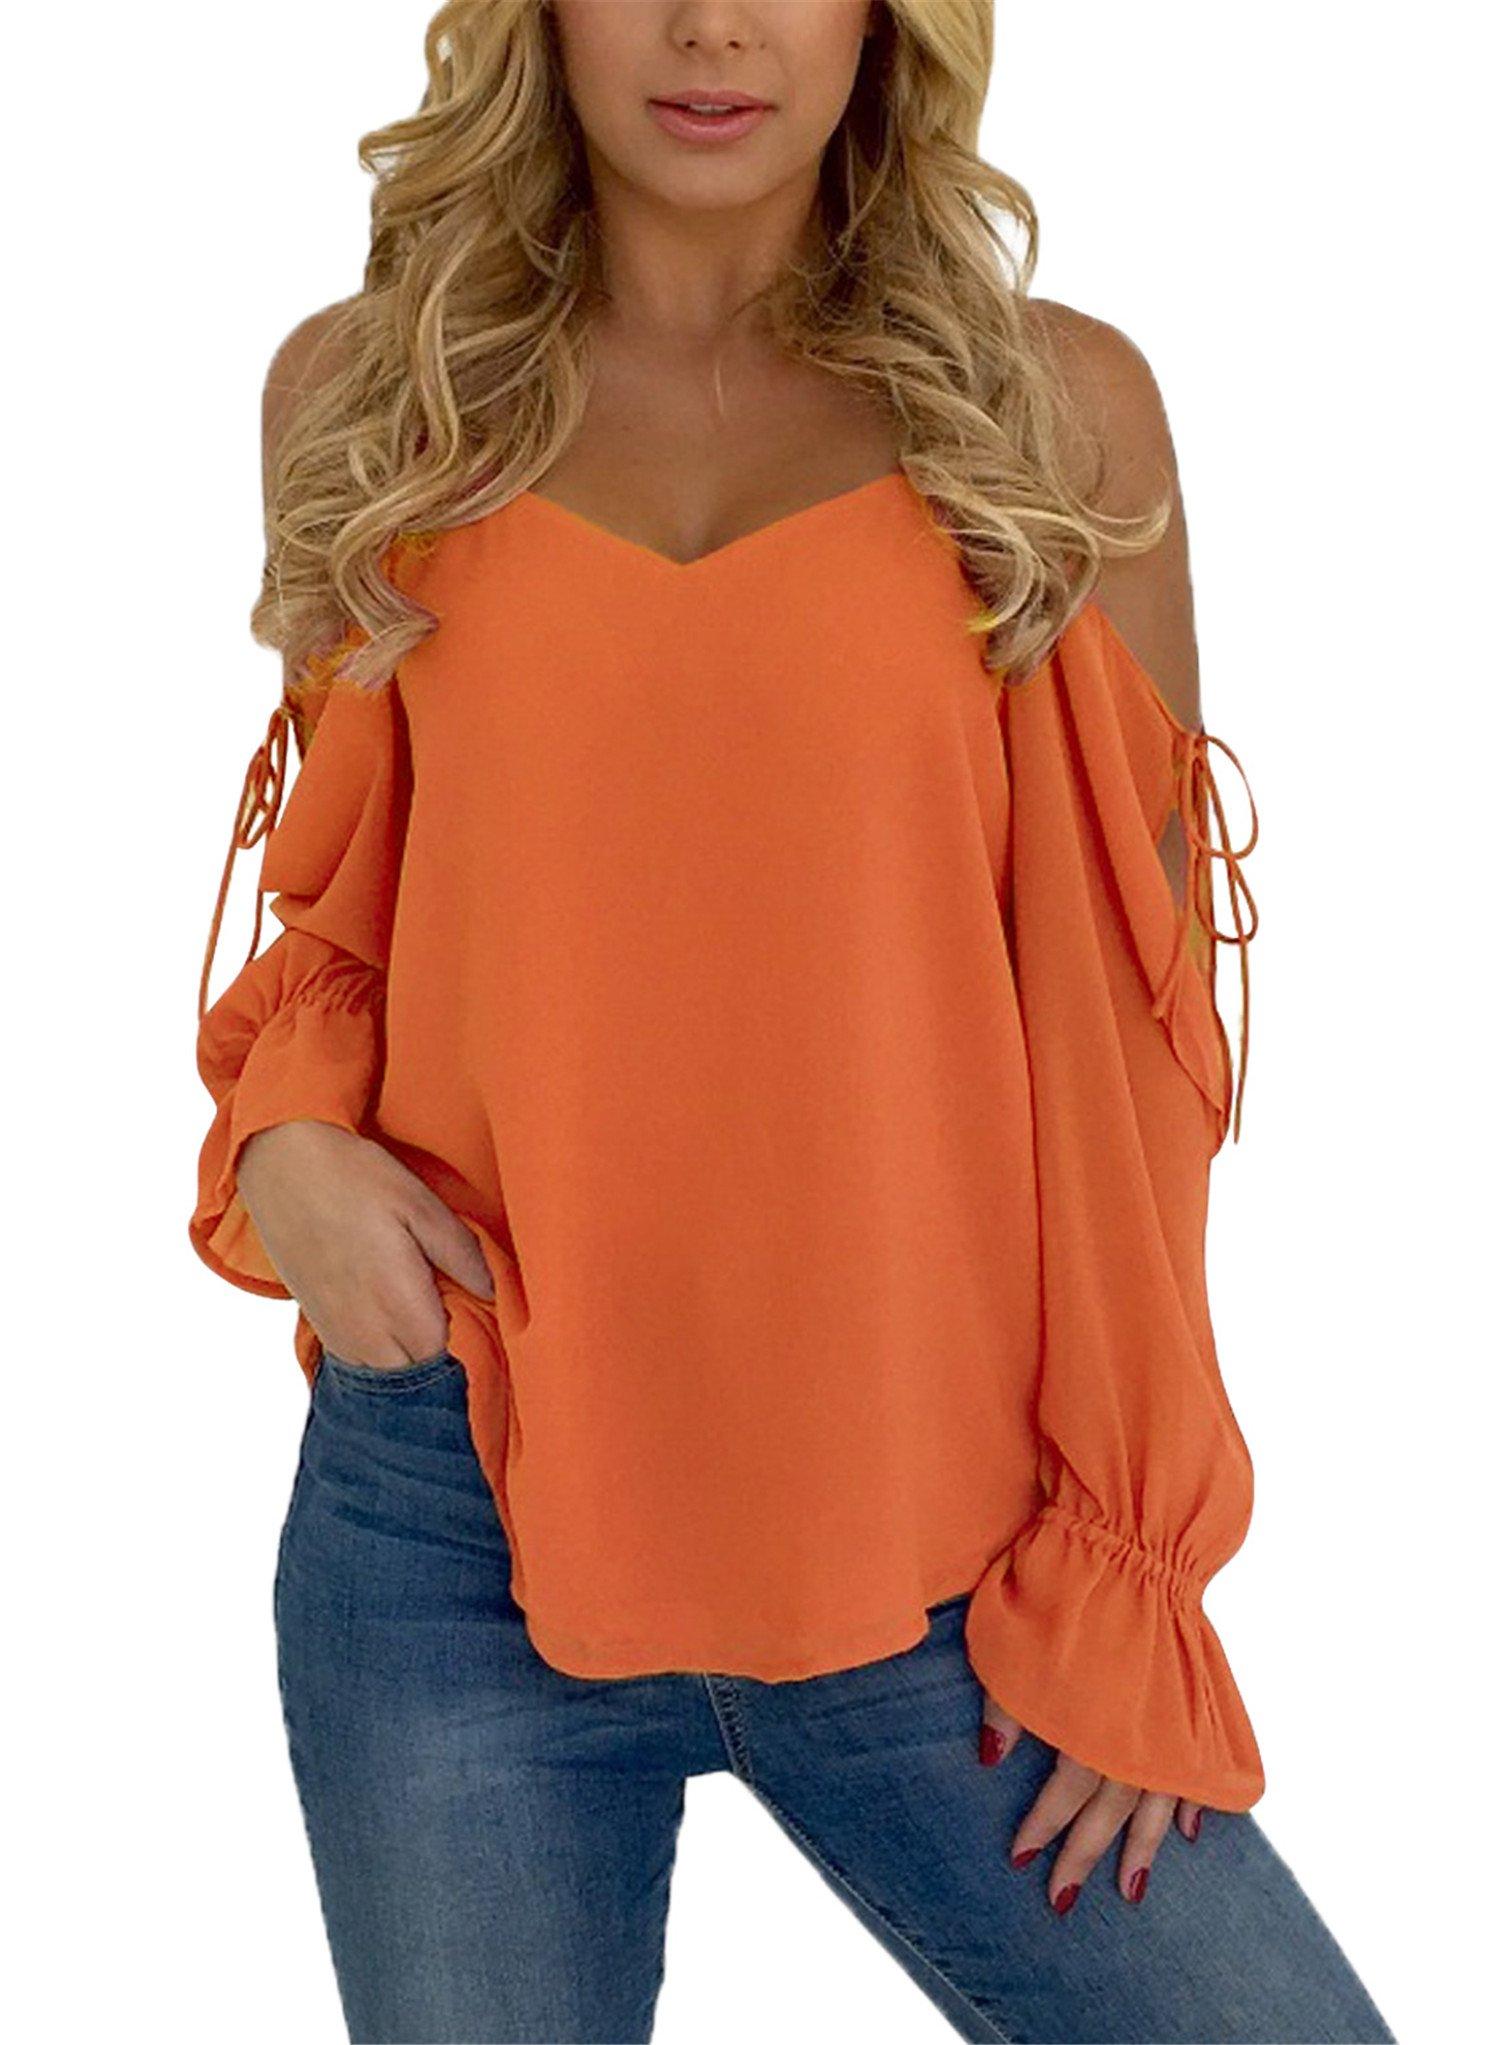 Blibea Womens Spaghetti Strap Loose T Shirts Off Shoulder Blouse Long Flared Ruffled Sleeve Shirts Elegant Tee Tops Medium Orange by Blibea (Image #1)